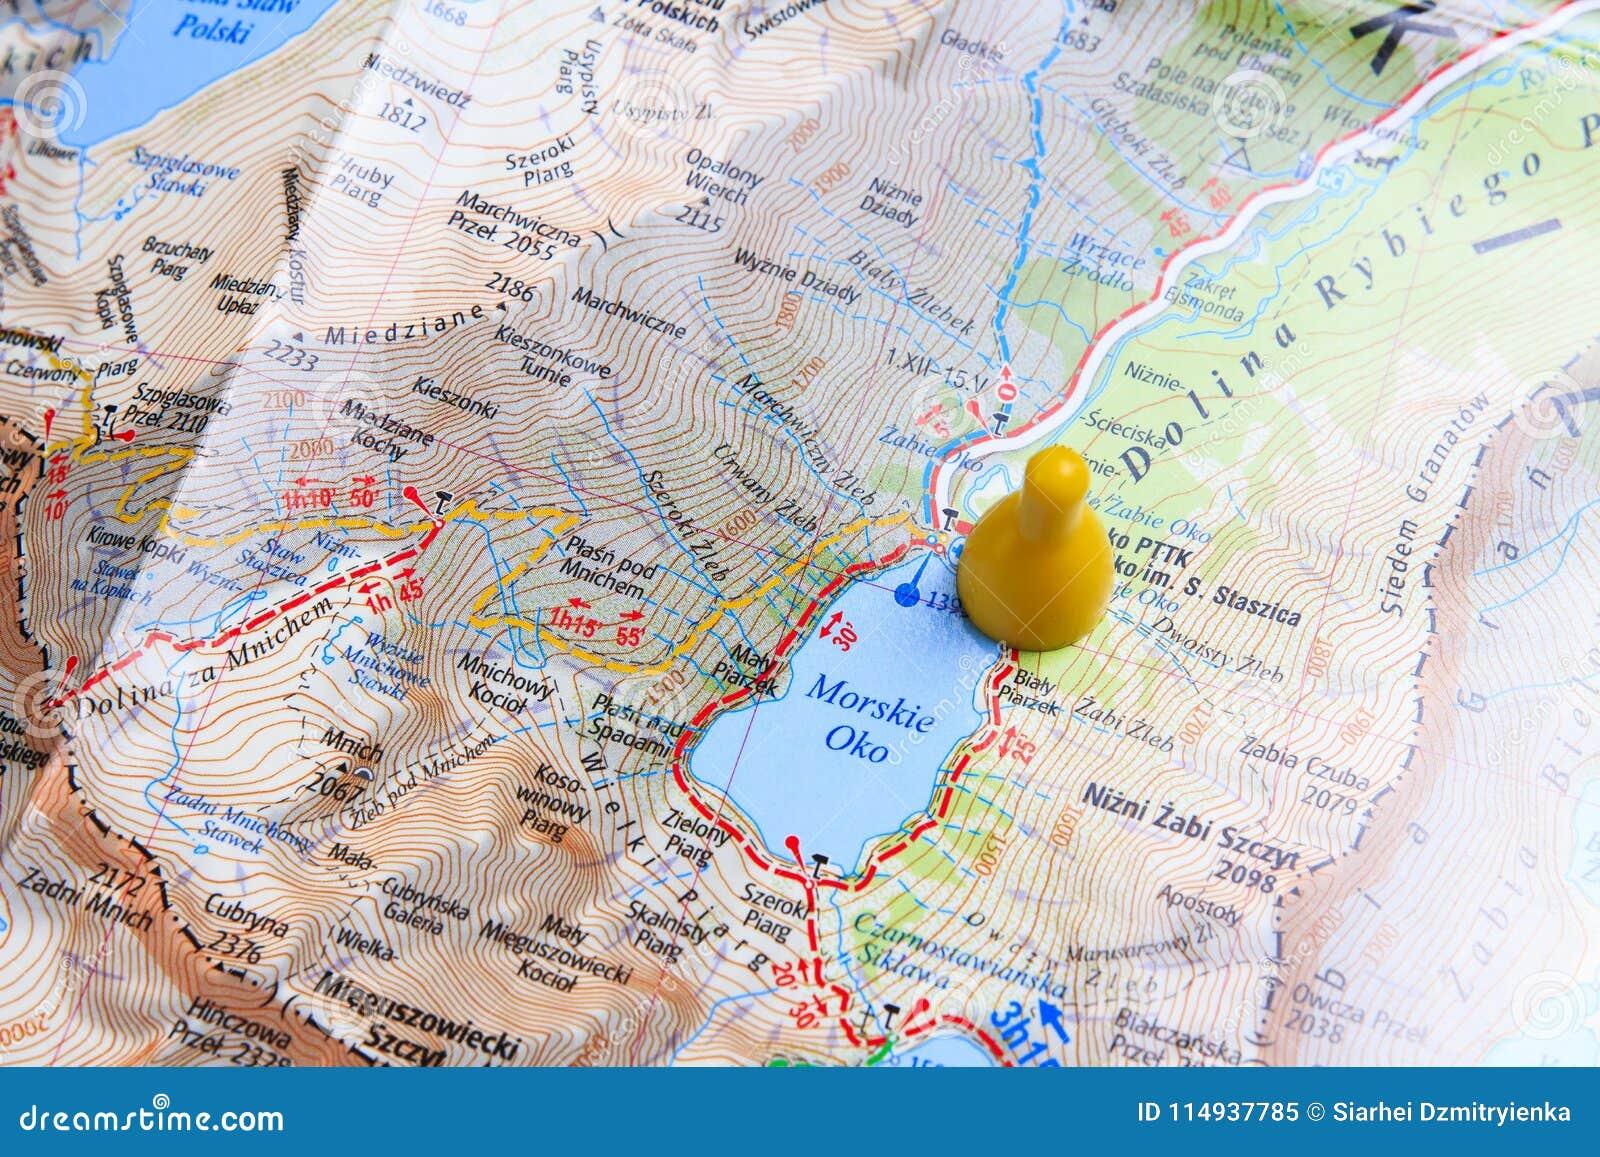 map of zakopane close up. walking route through the mountains